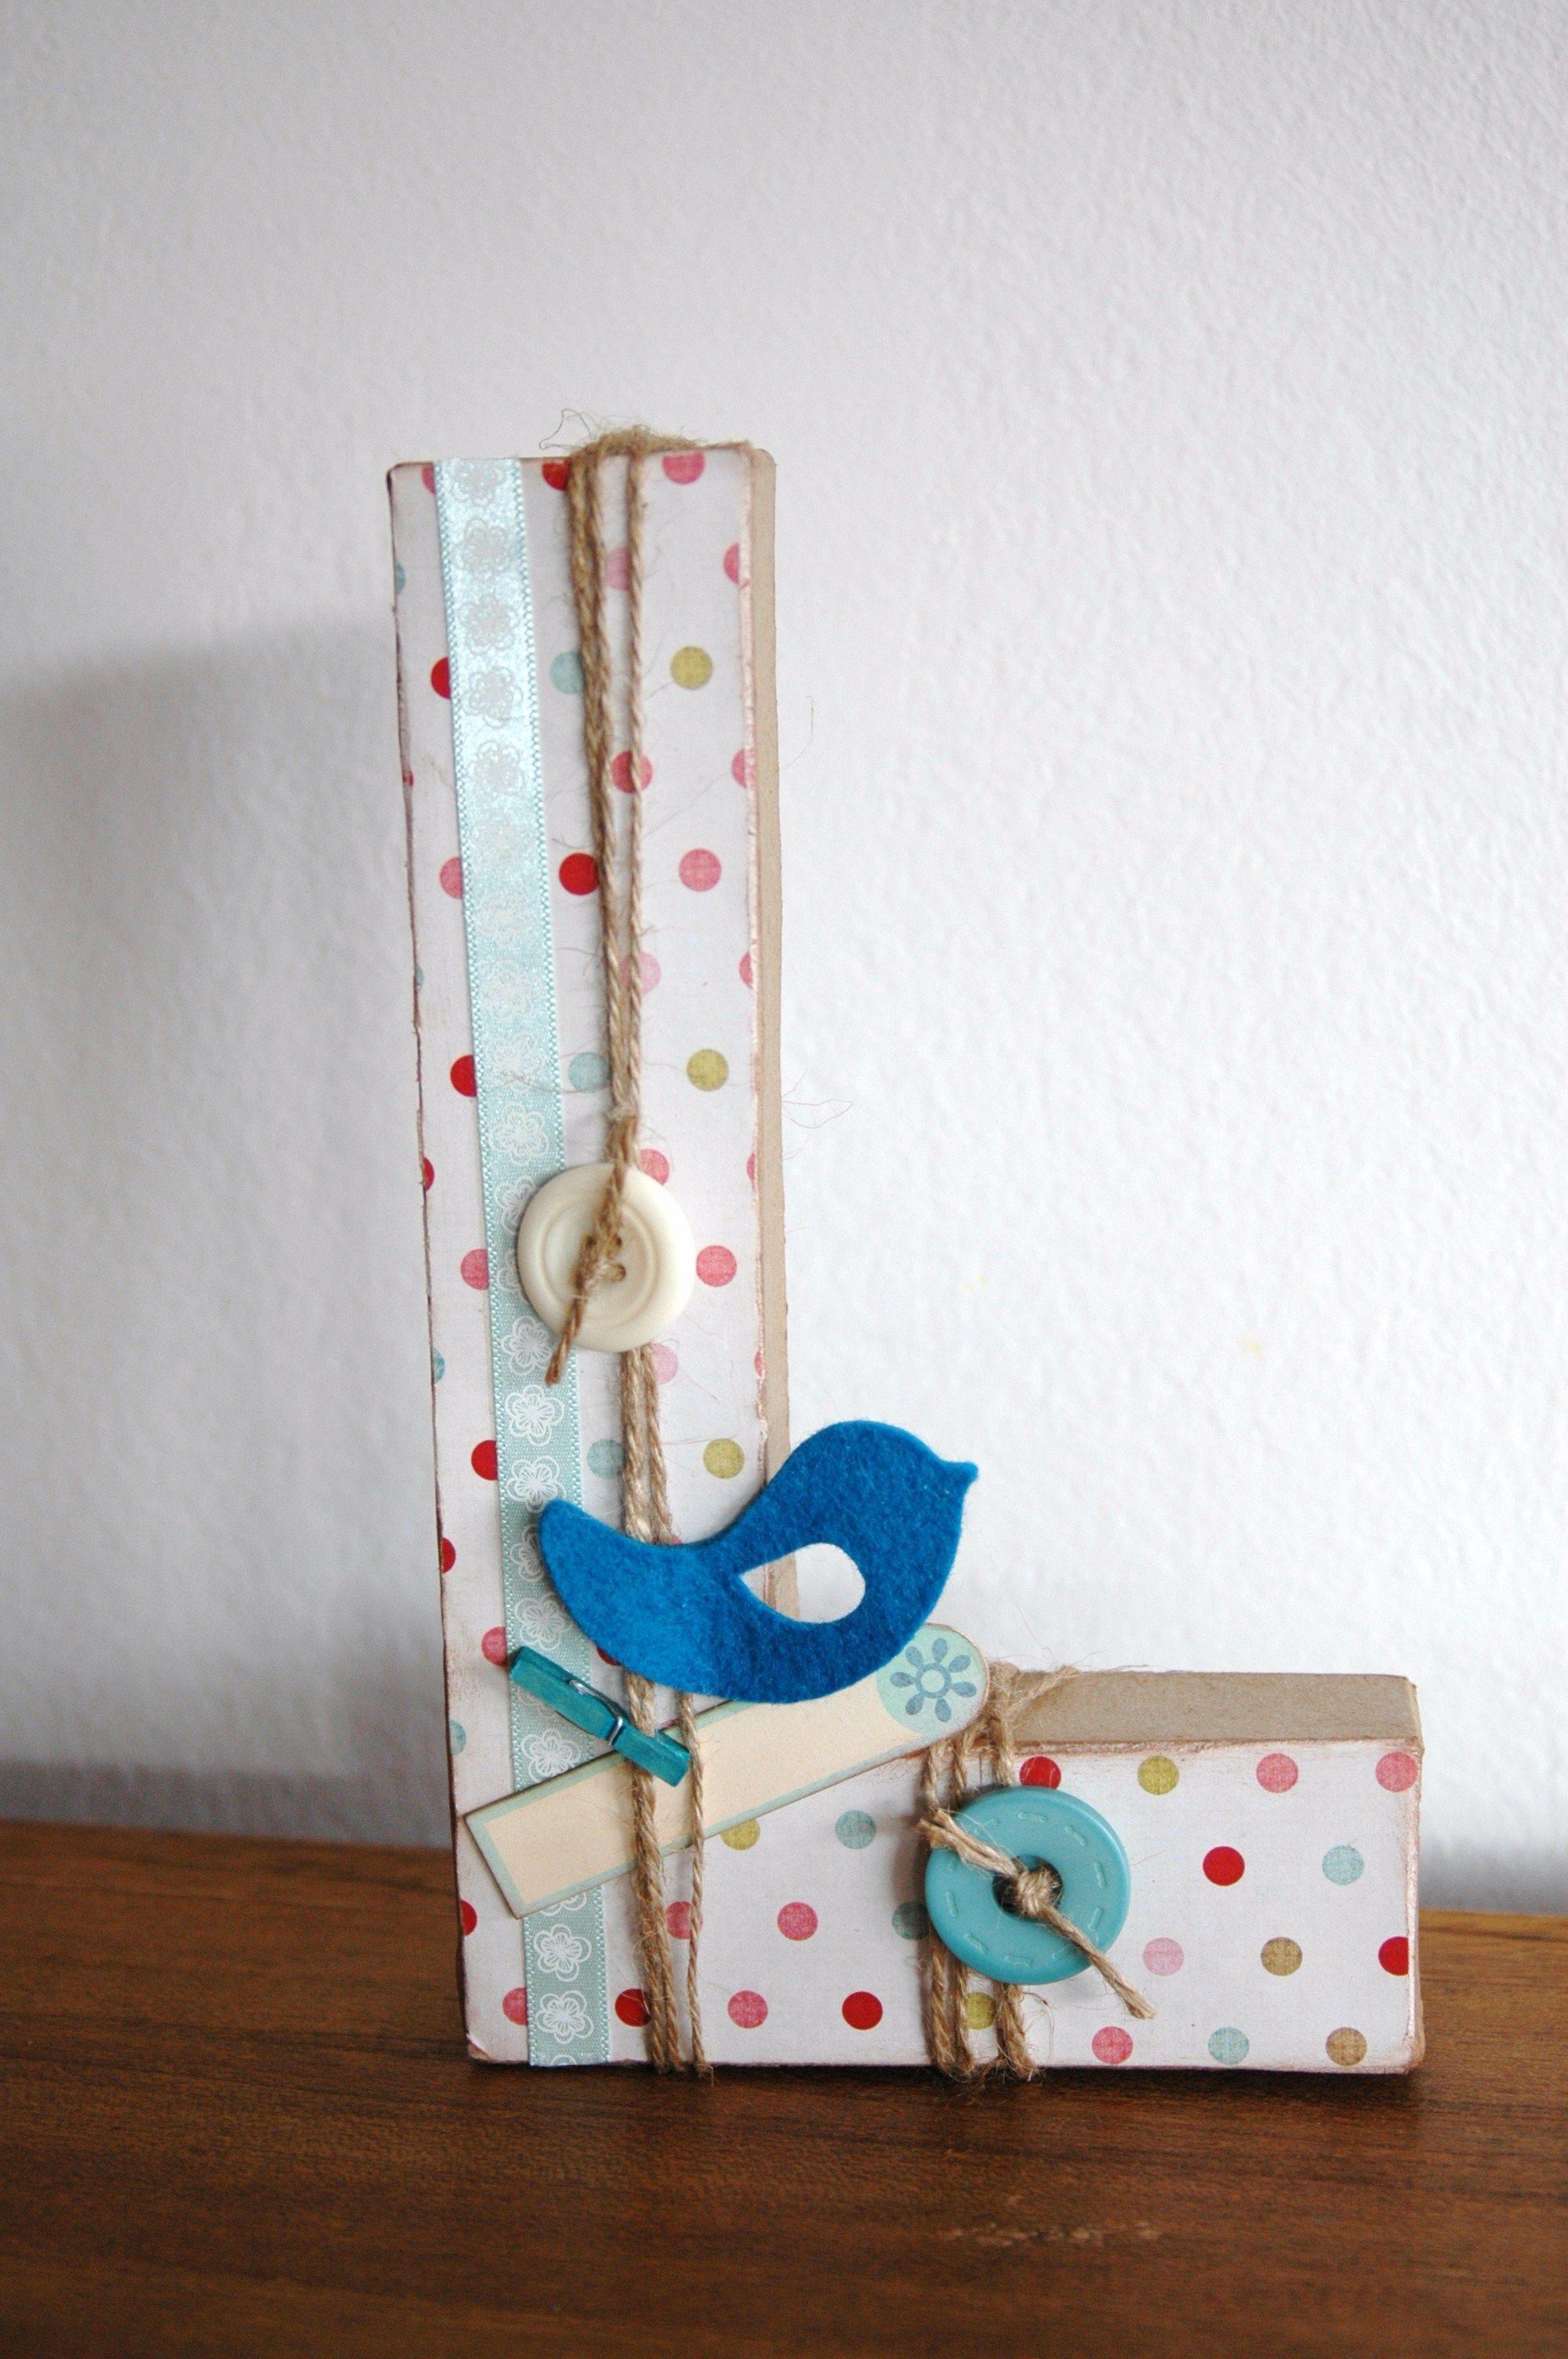 Letras para decorar habitaci n infantil home decor - Letras infantiles para decorar ...